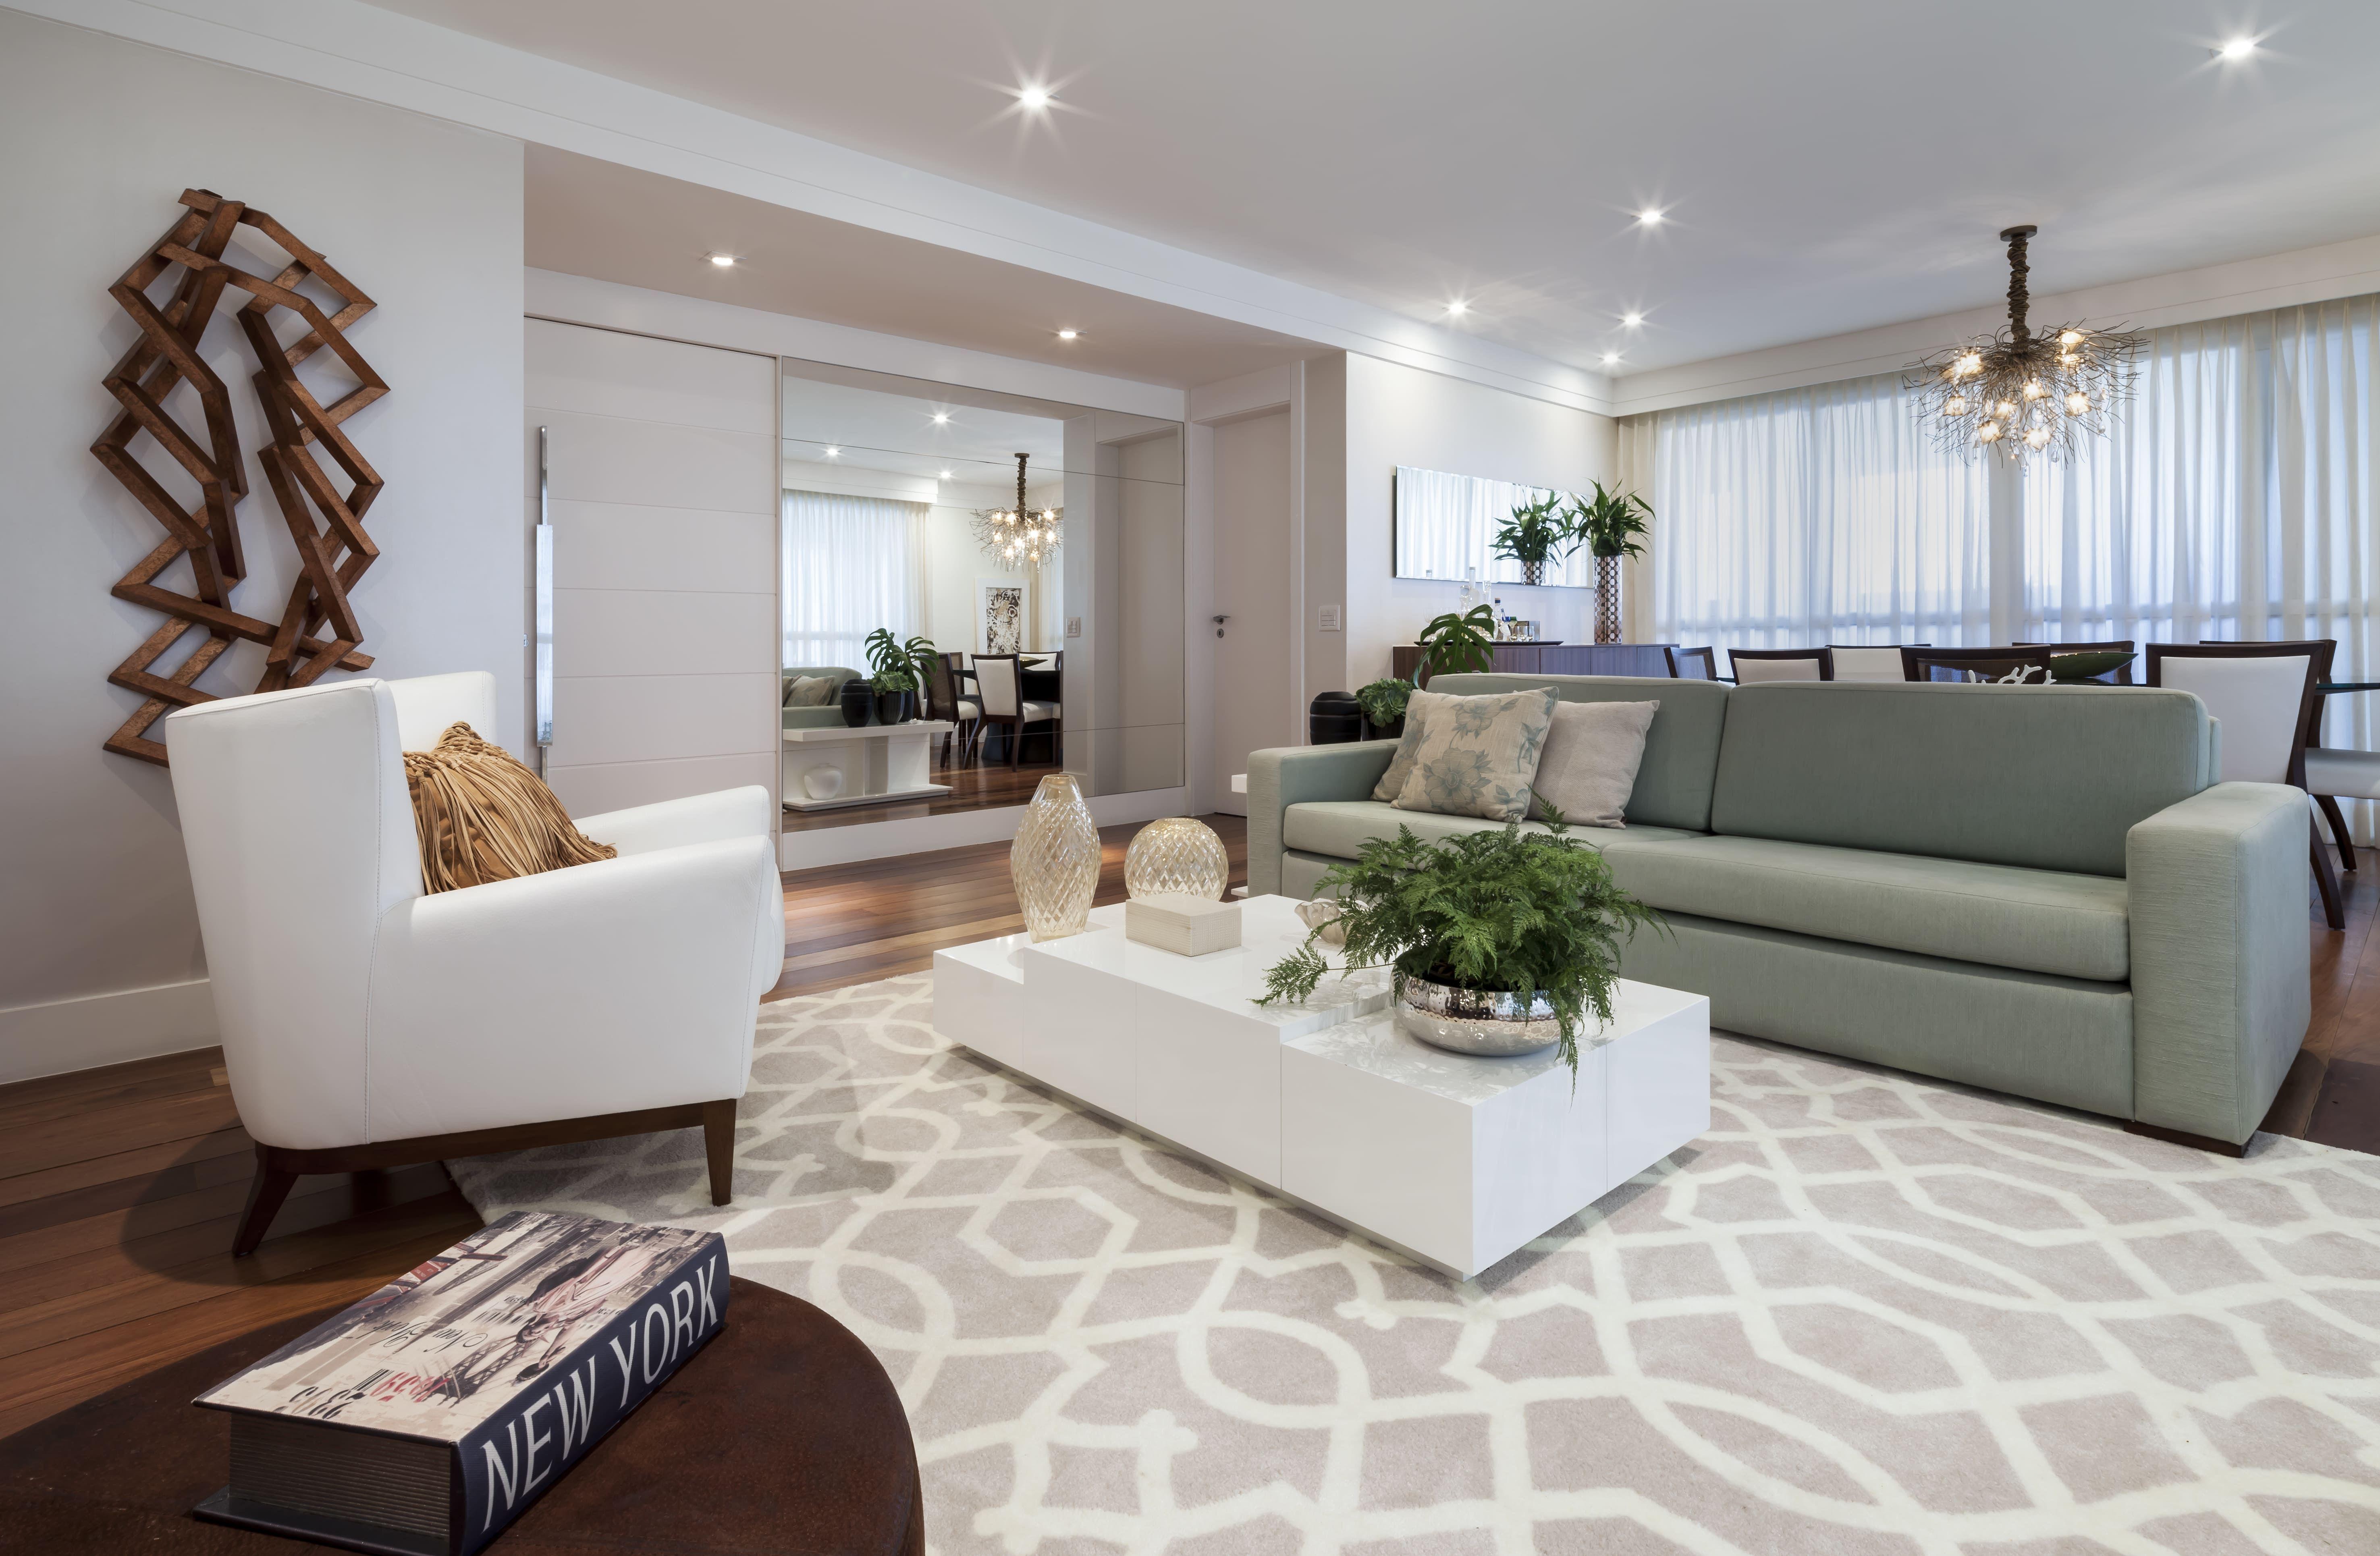 Limpar Carpete De Cor Clara Tapetes Para Sala Dicas De Decoracao Para Sala Decoracao Com Tapetes